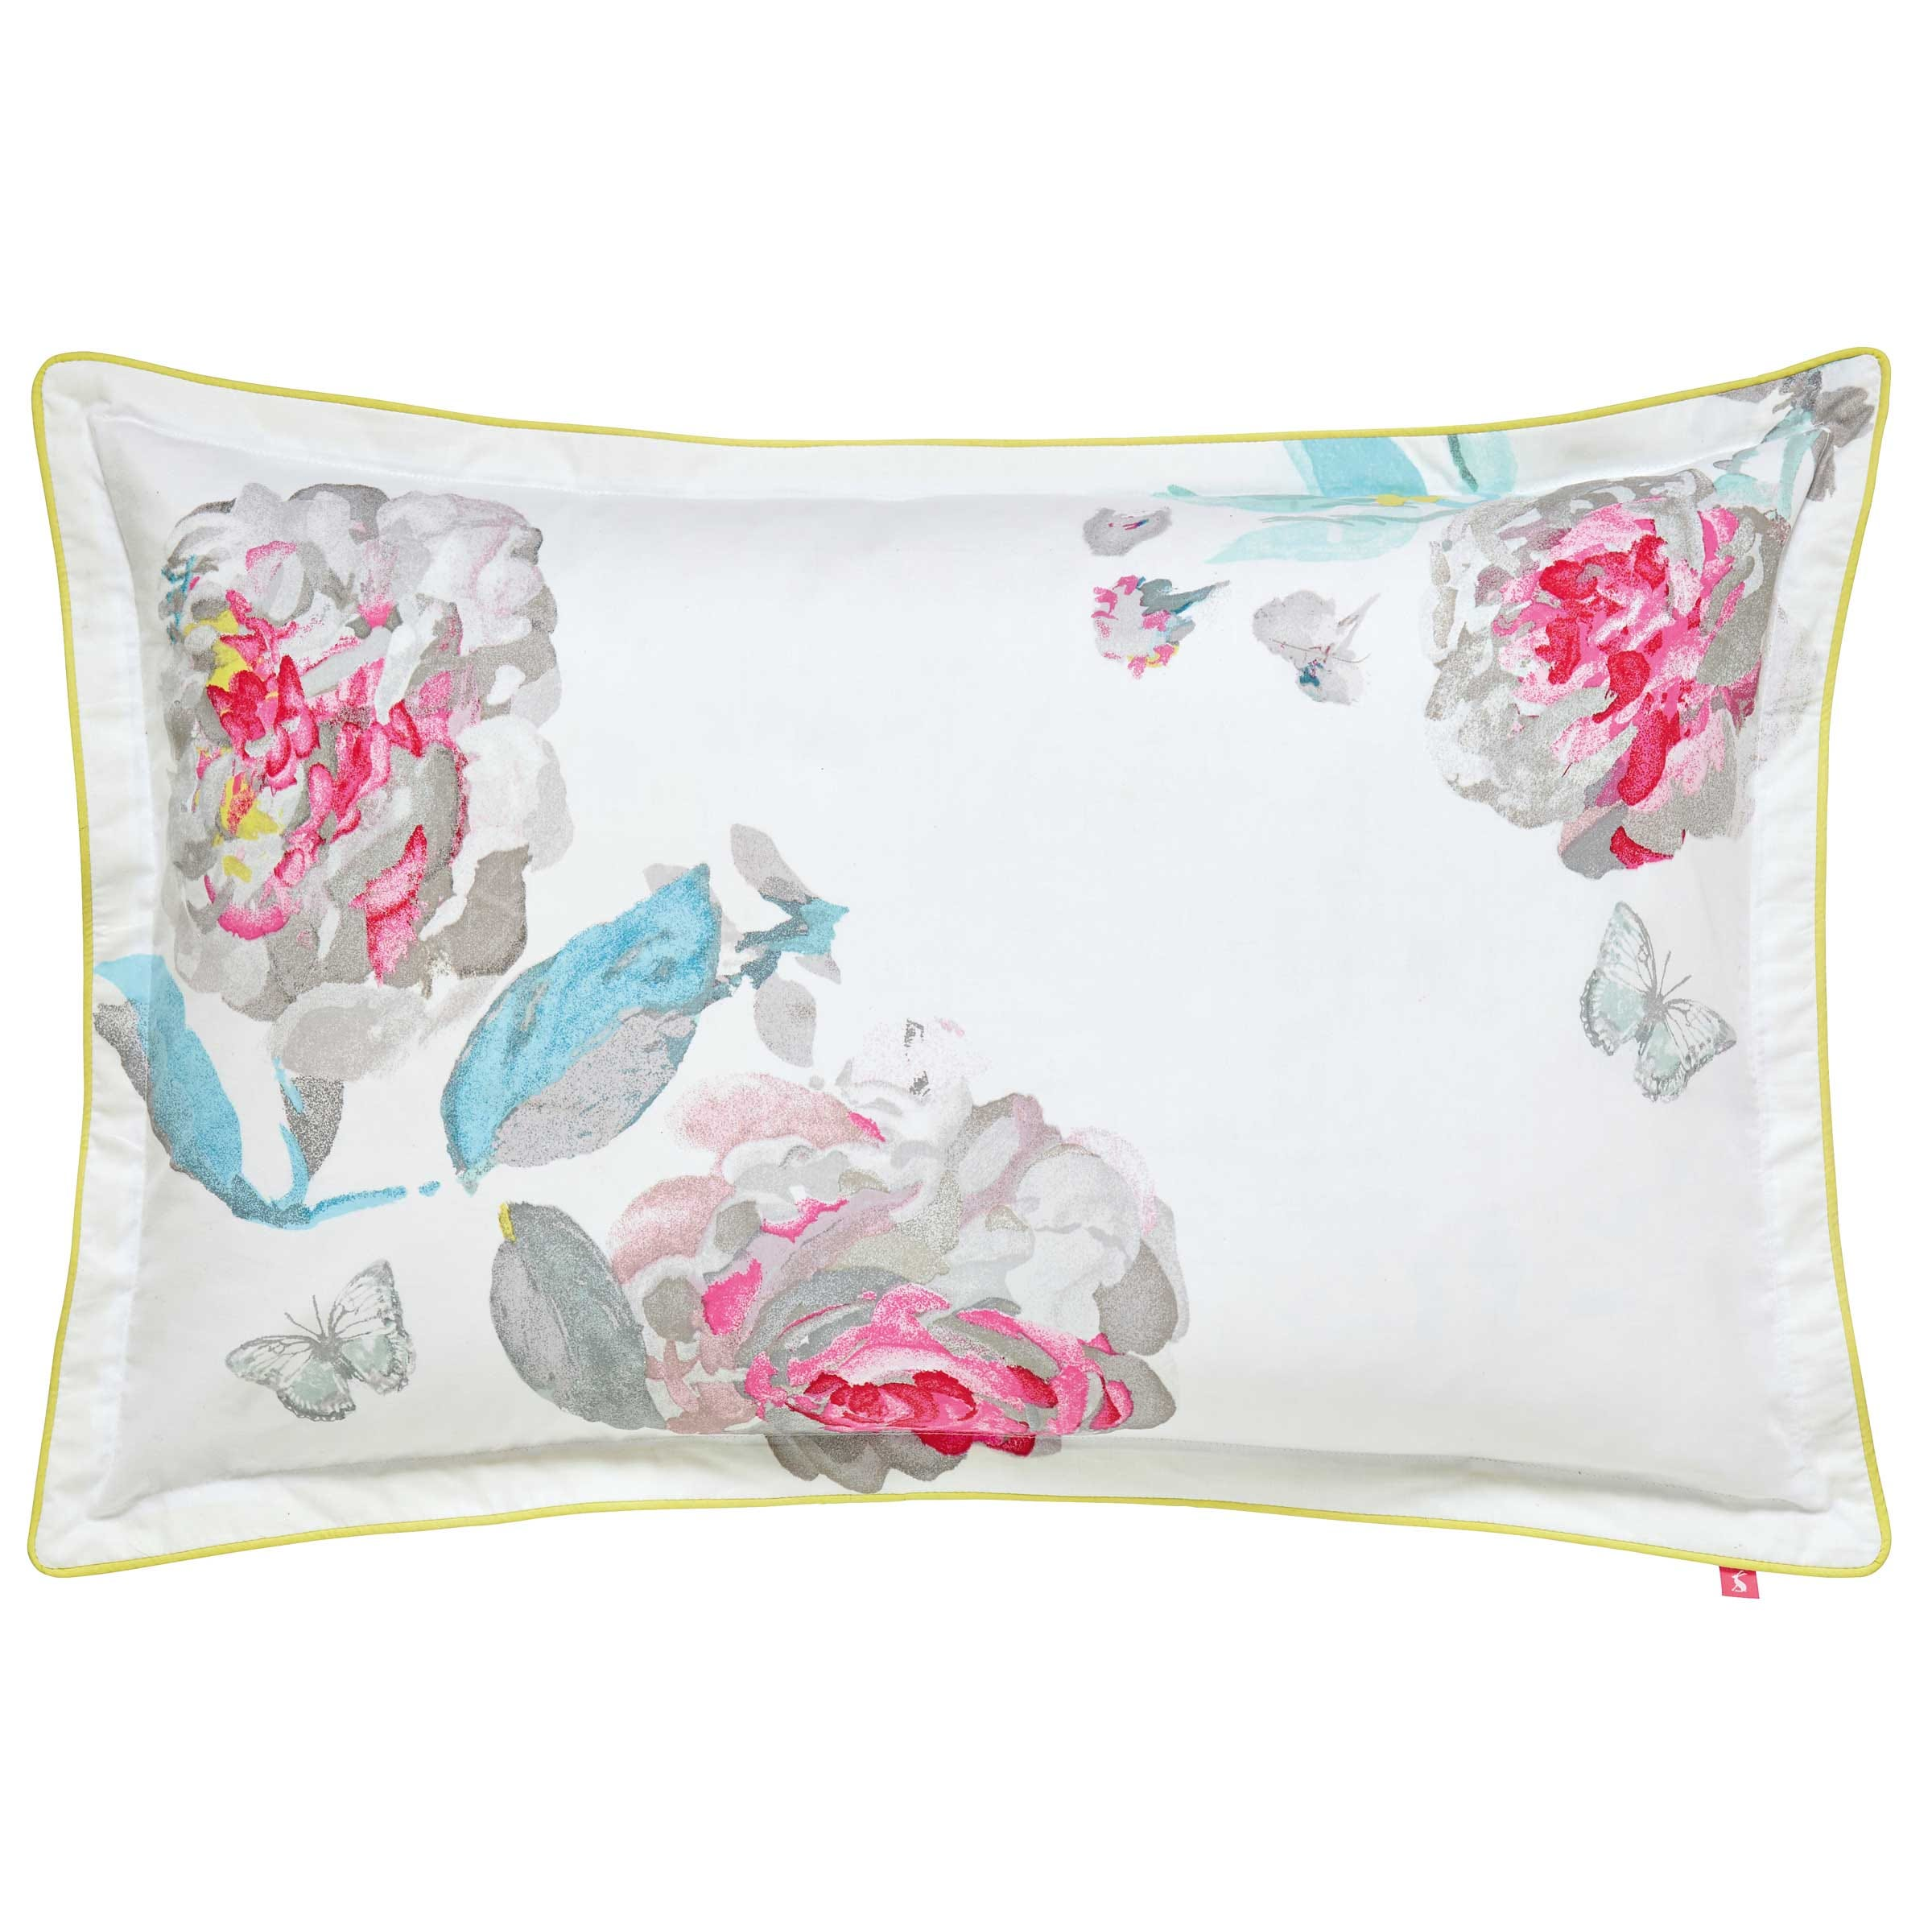 Bright White Beau Bloom Oxford Pillowcase Bedeck Home